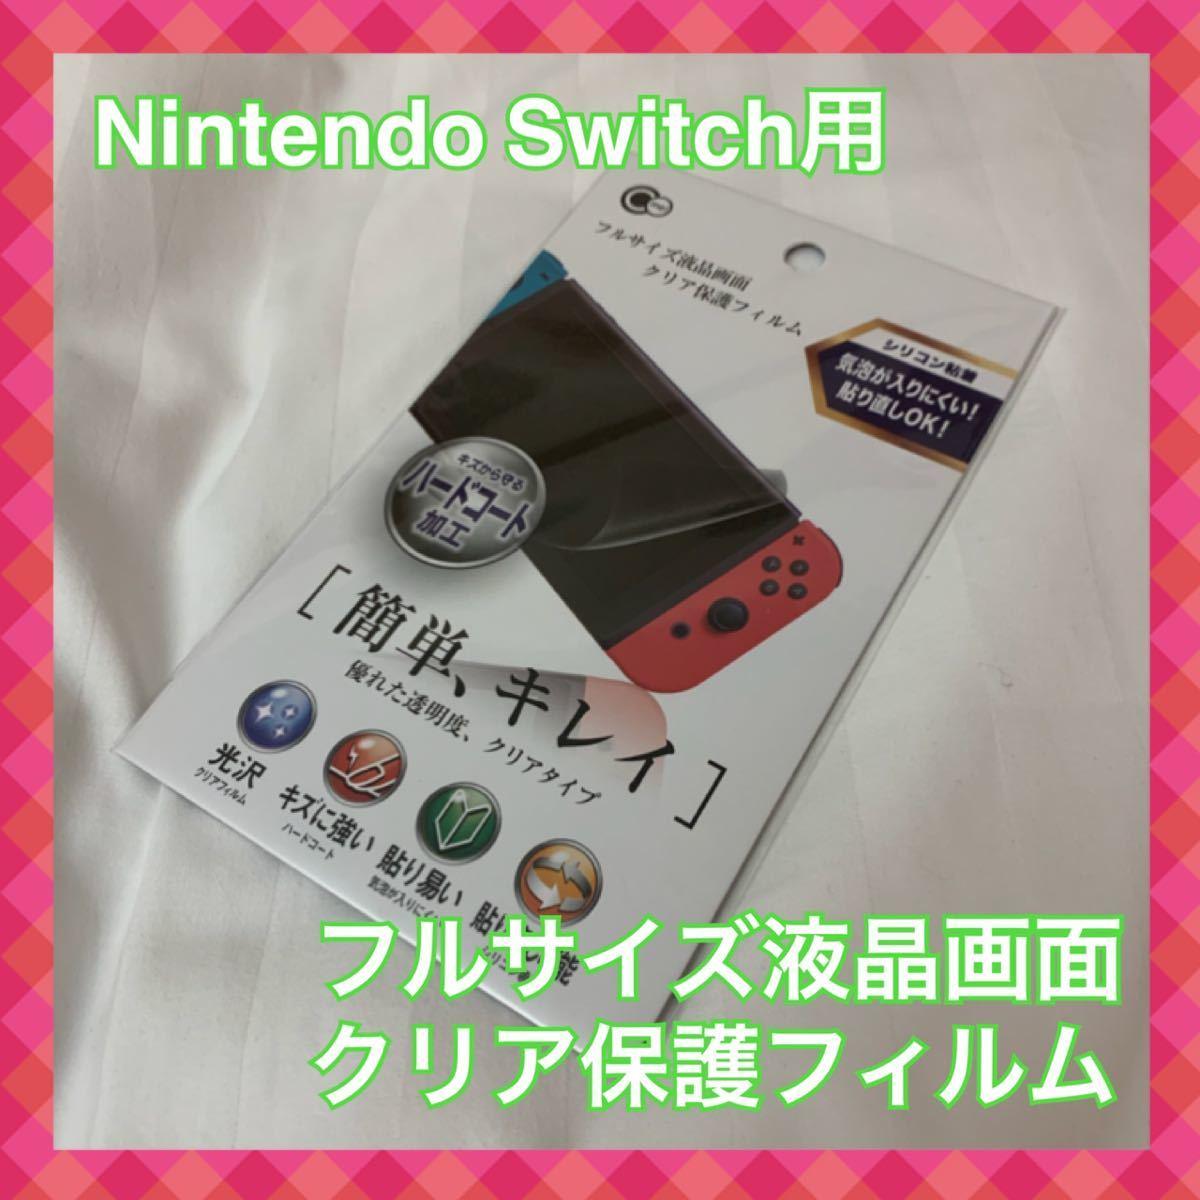 【Nintendo Switch用】フルサイズ液晶画面クリア保護フィルム